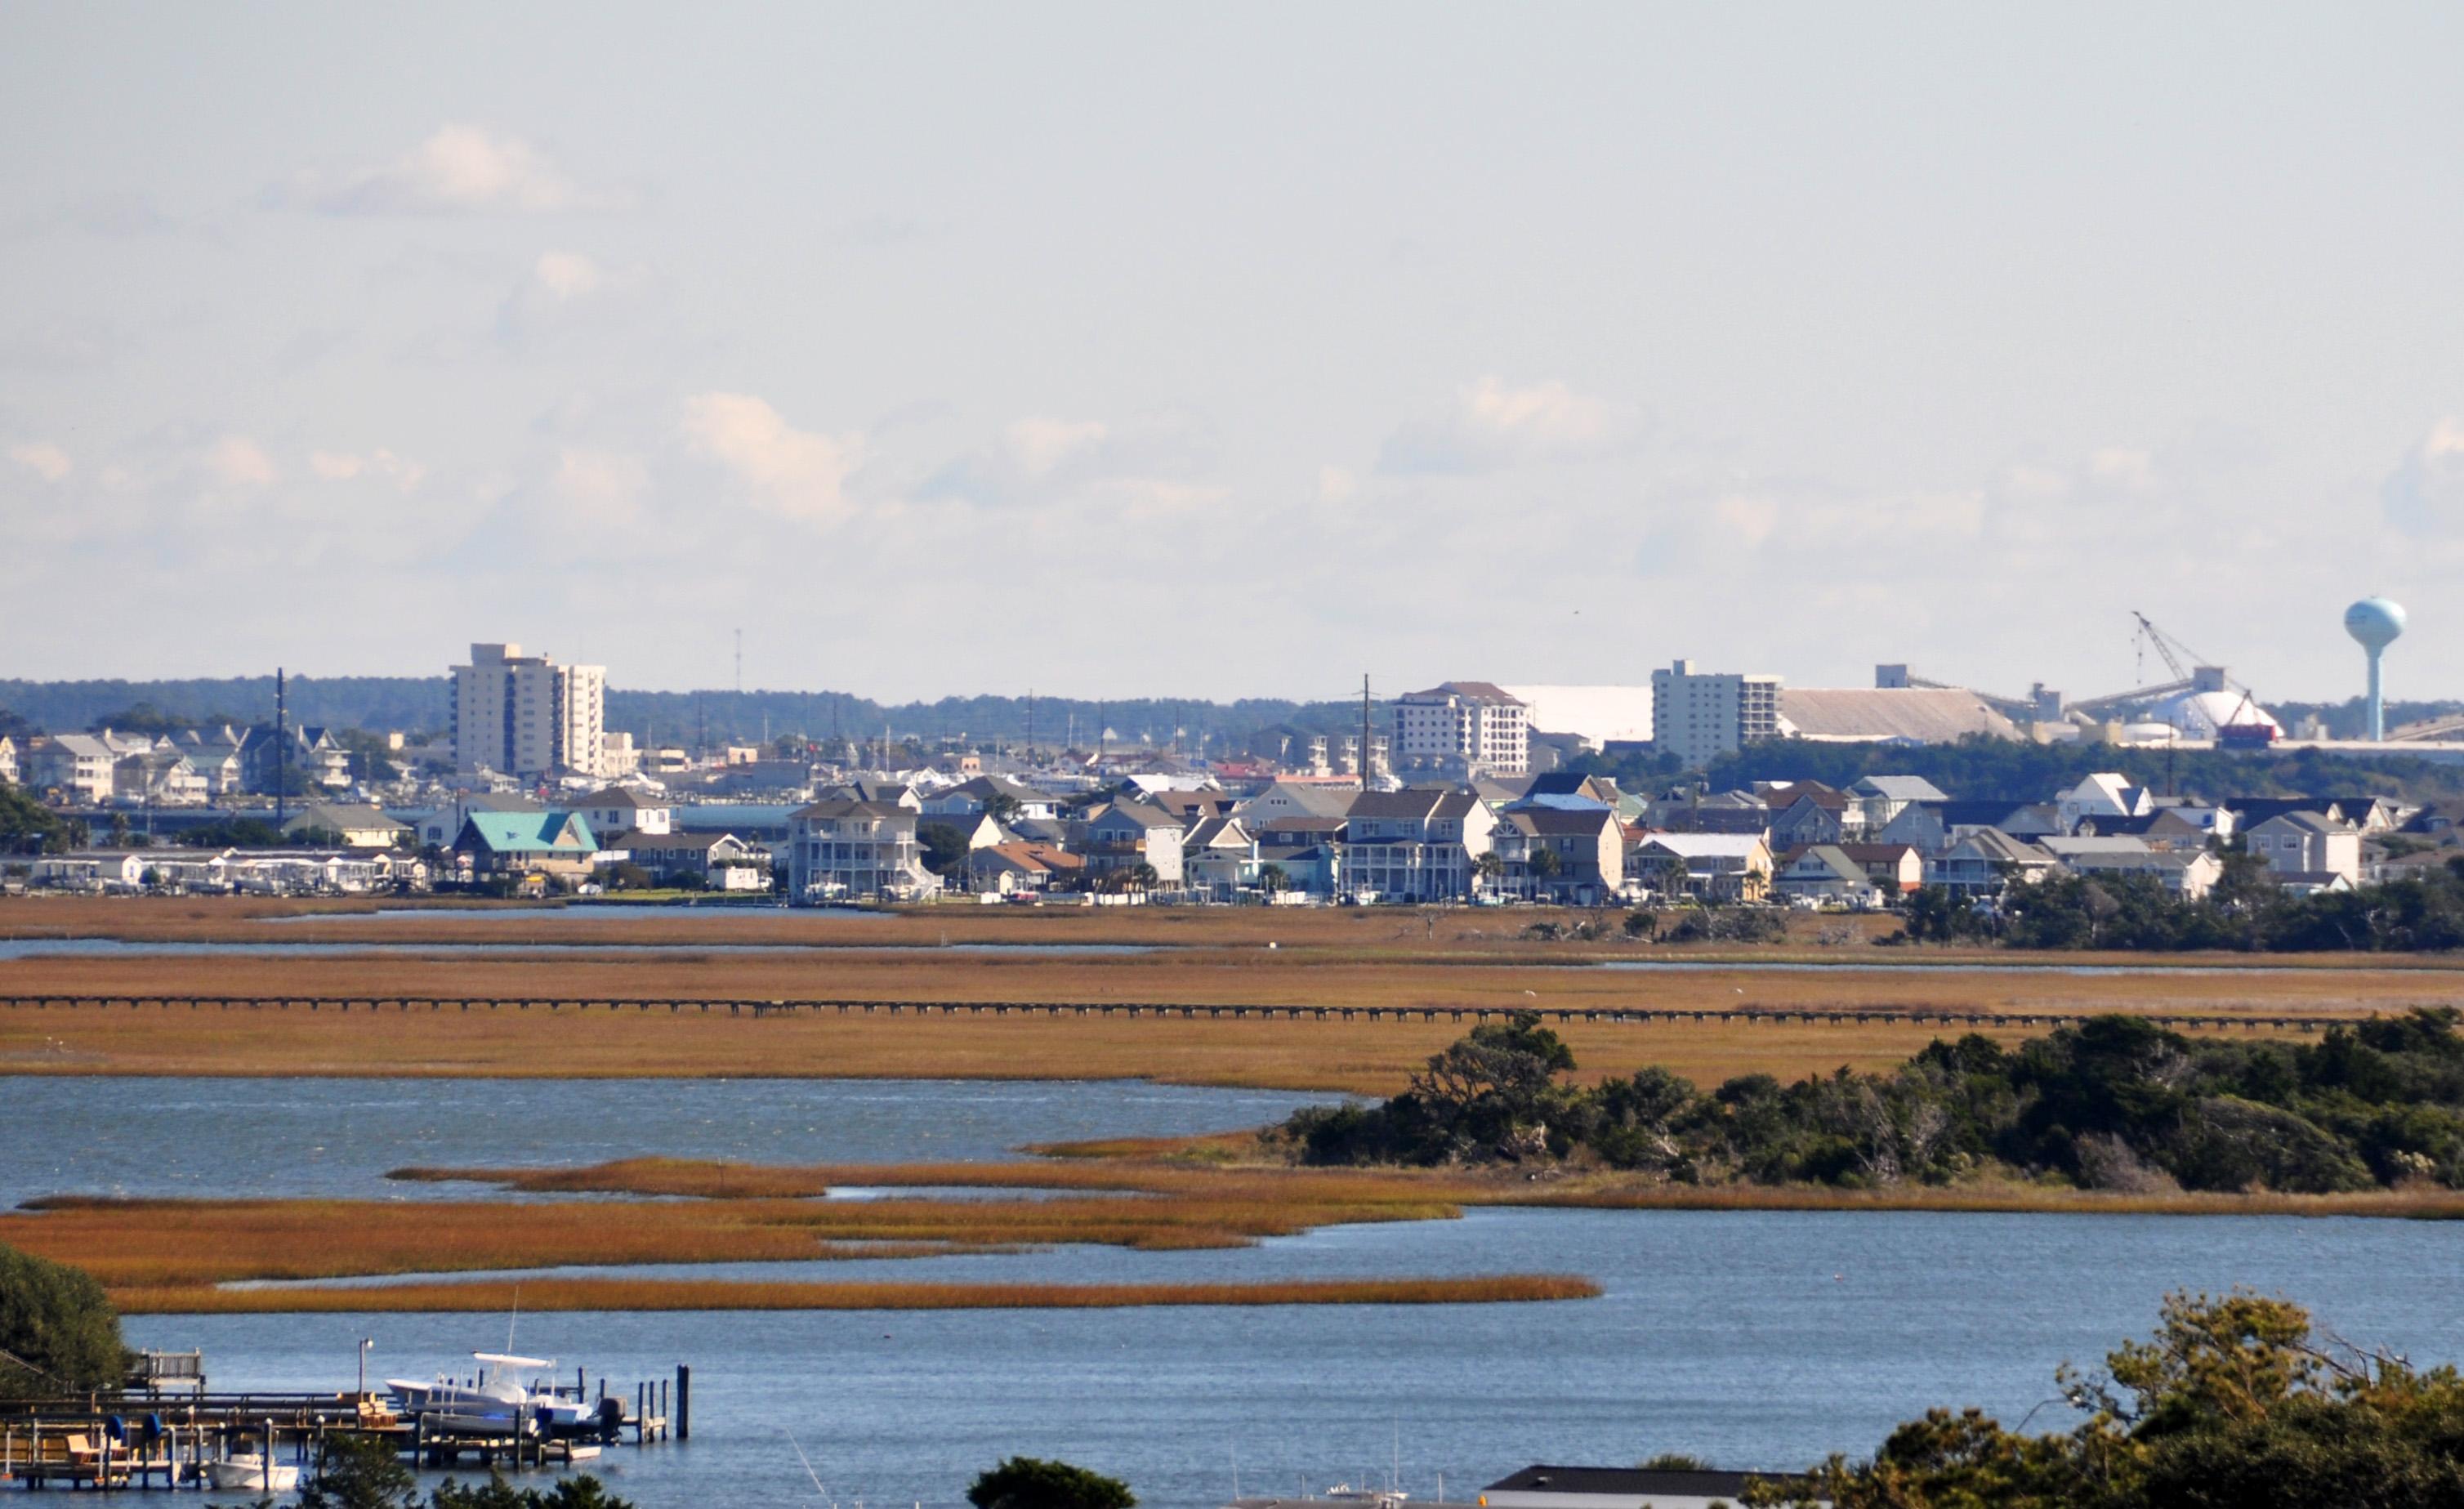 Cool Image Morehead City